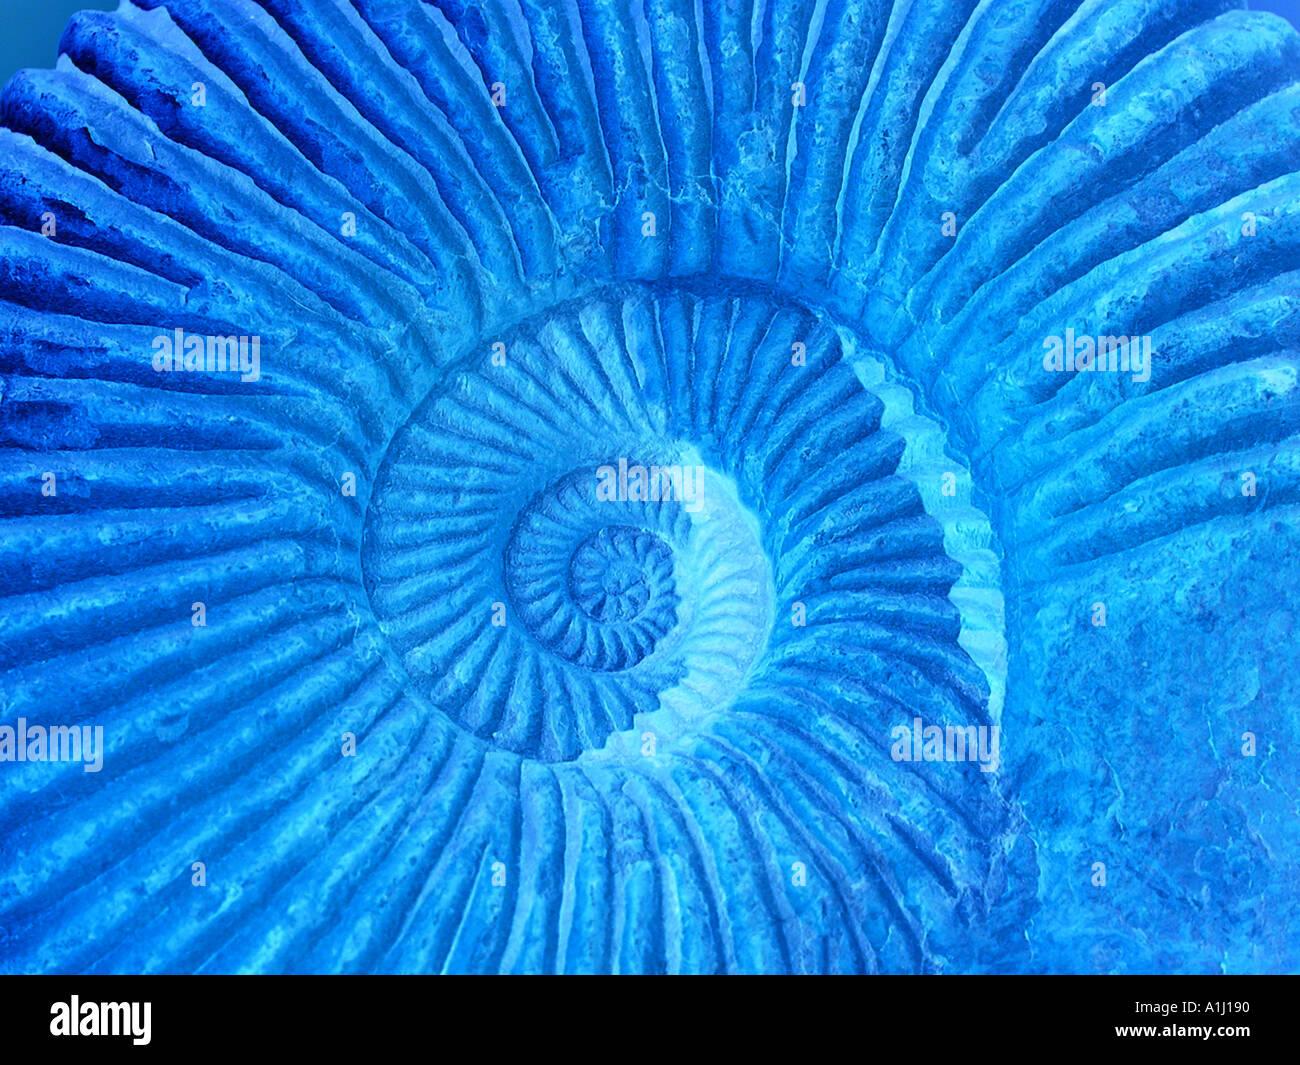 Mer Amonitas fossiles marocains Photo Stock